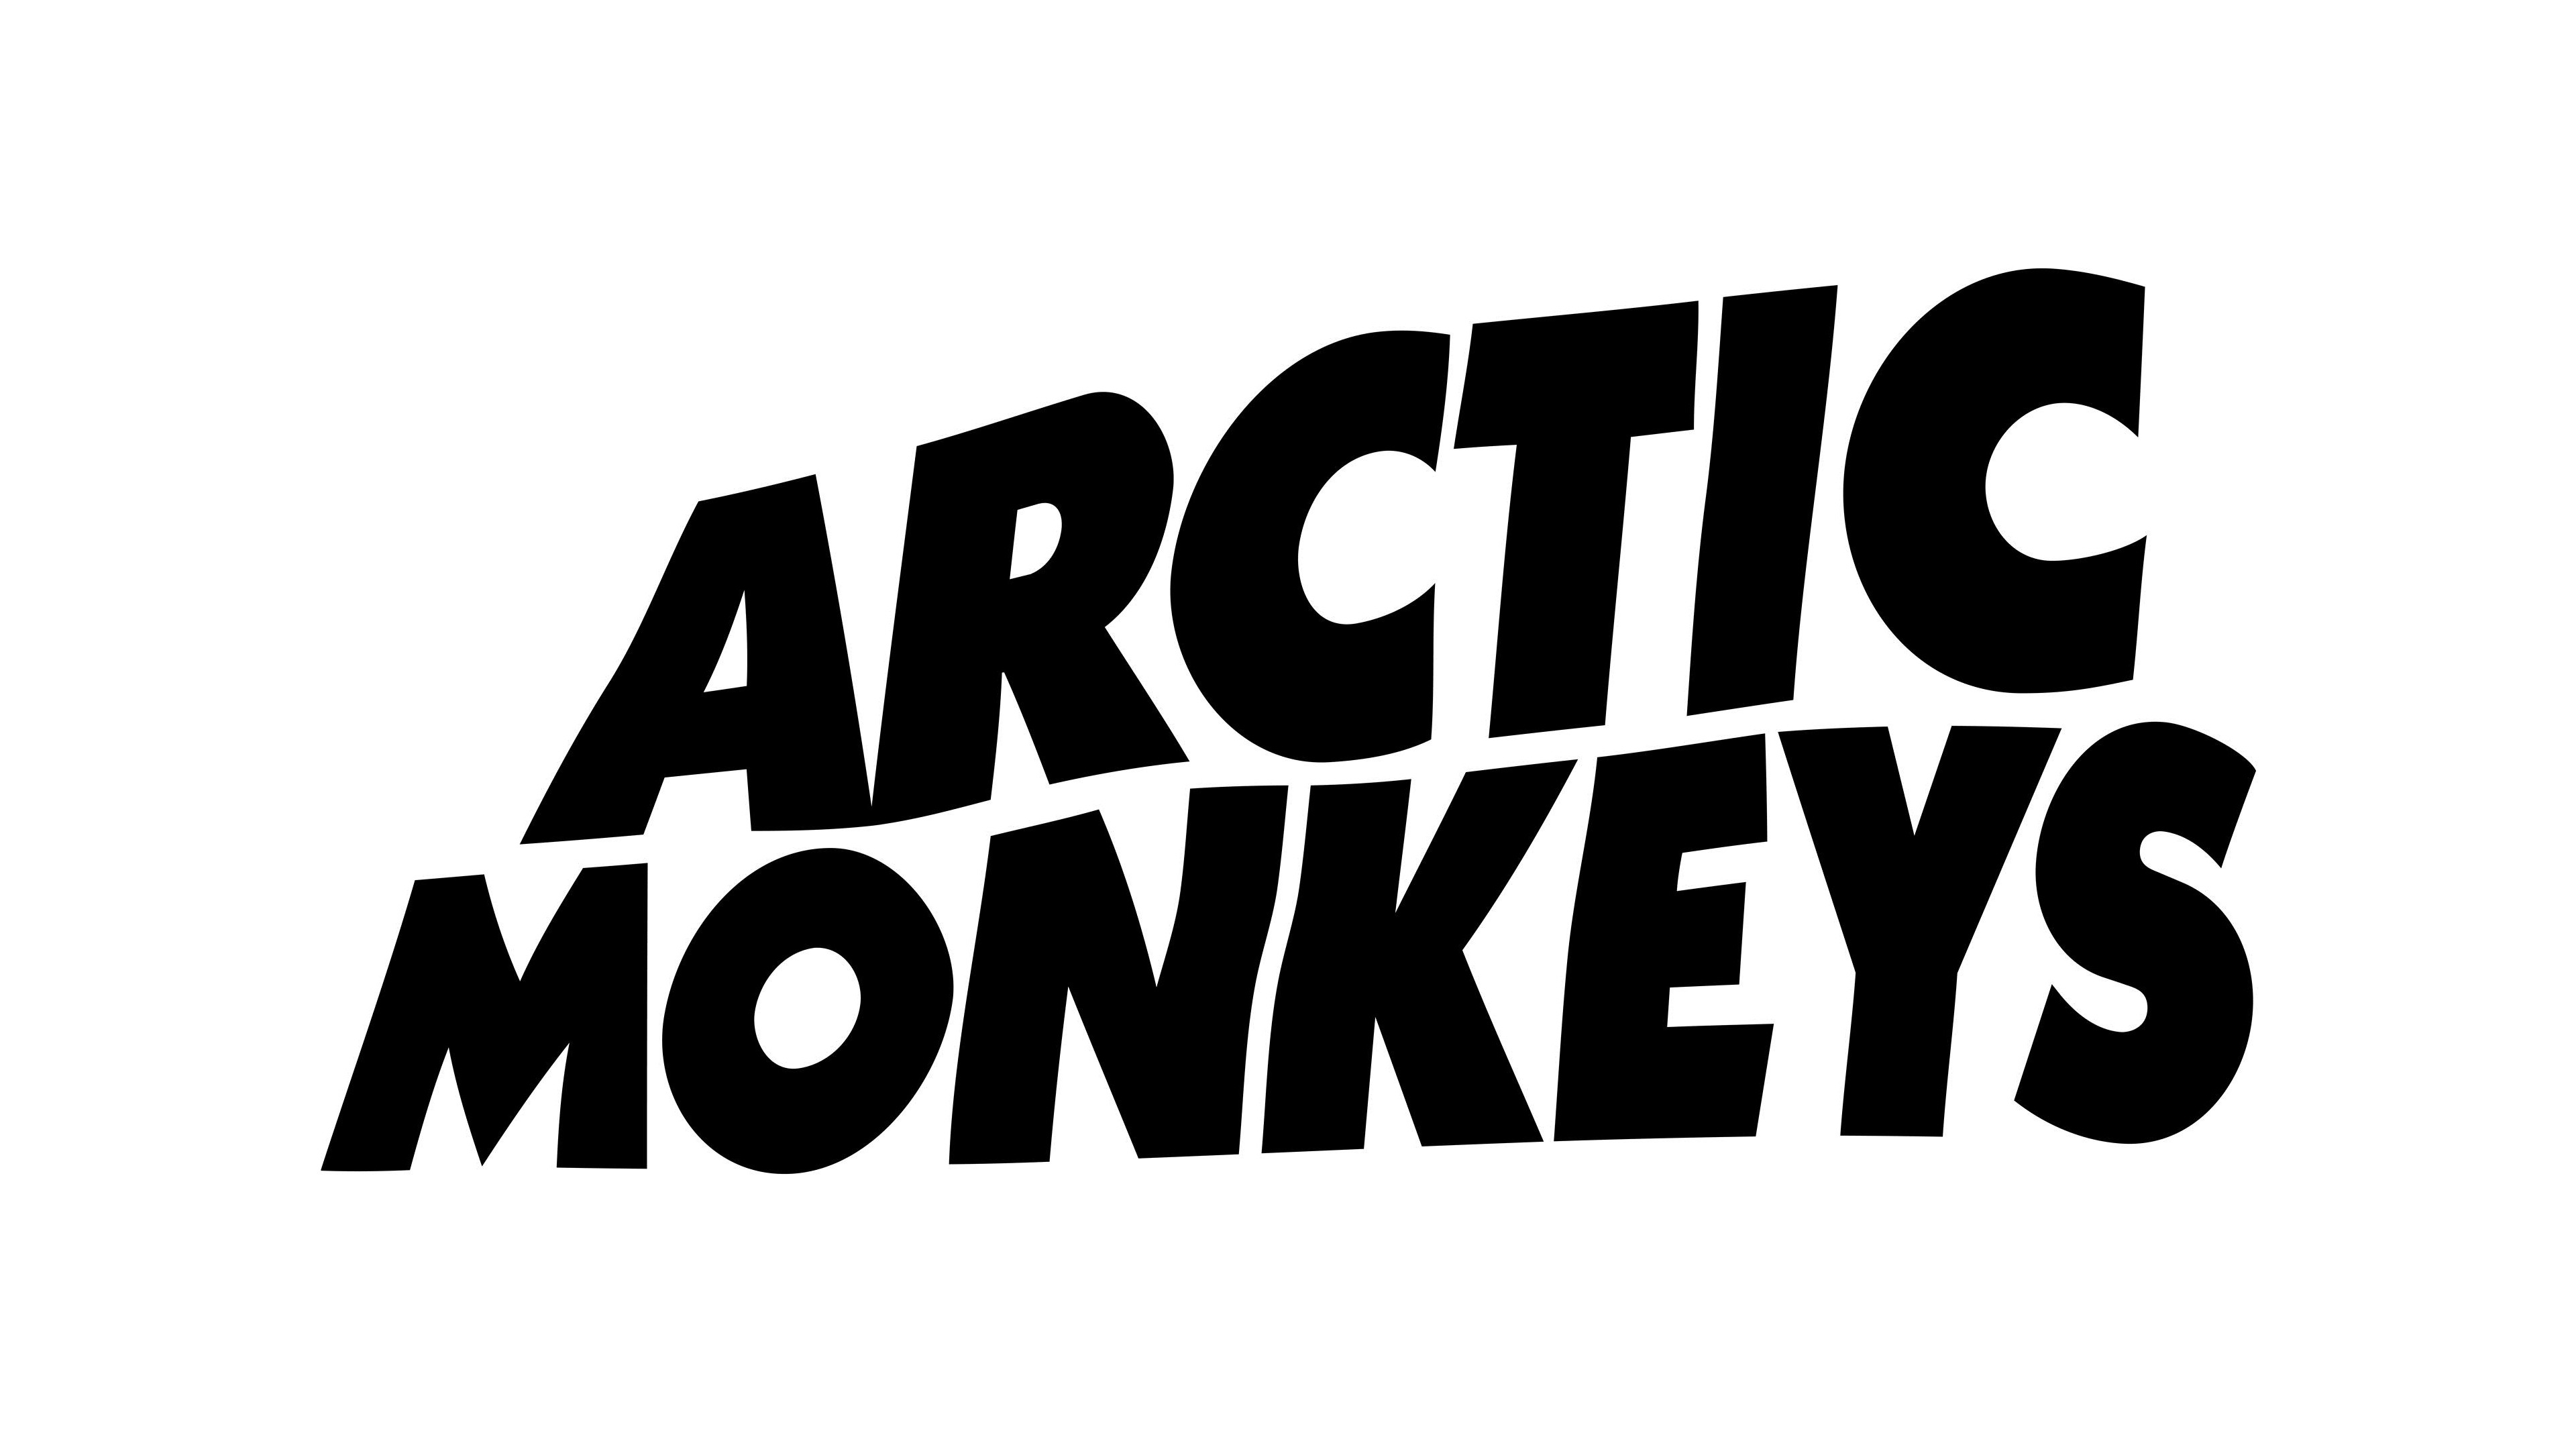 General 3840x2160 Arctic Monkeys logo monochrome typography